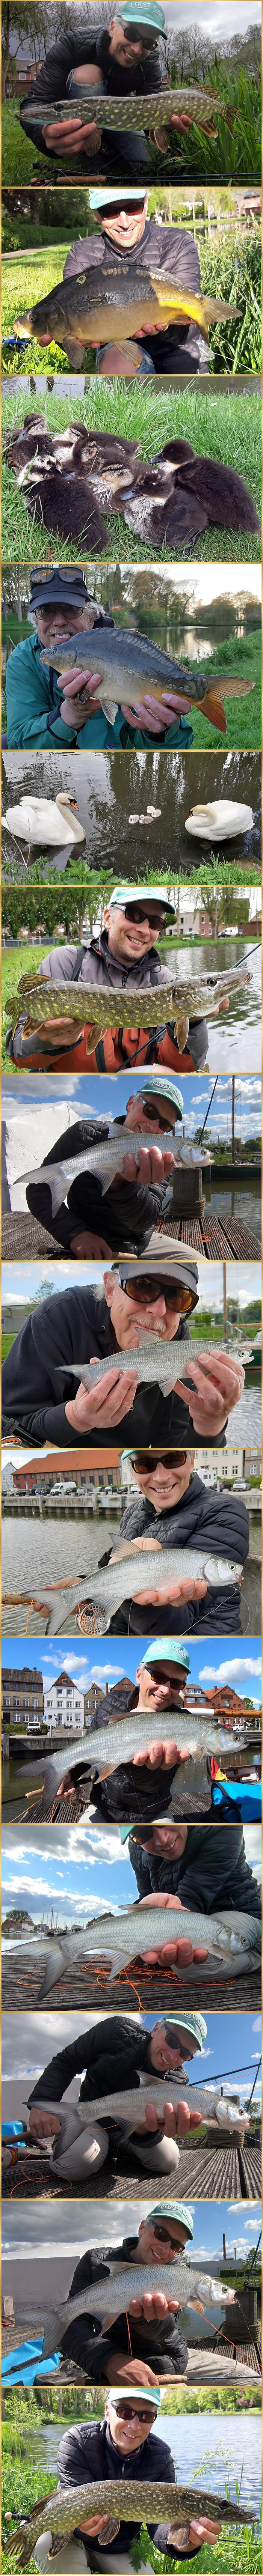 flyfishing asp pike carp